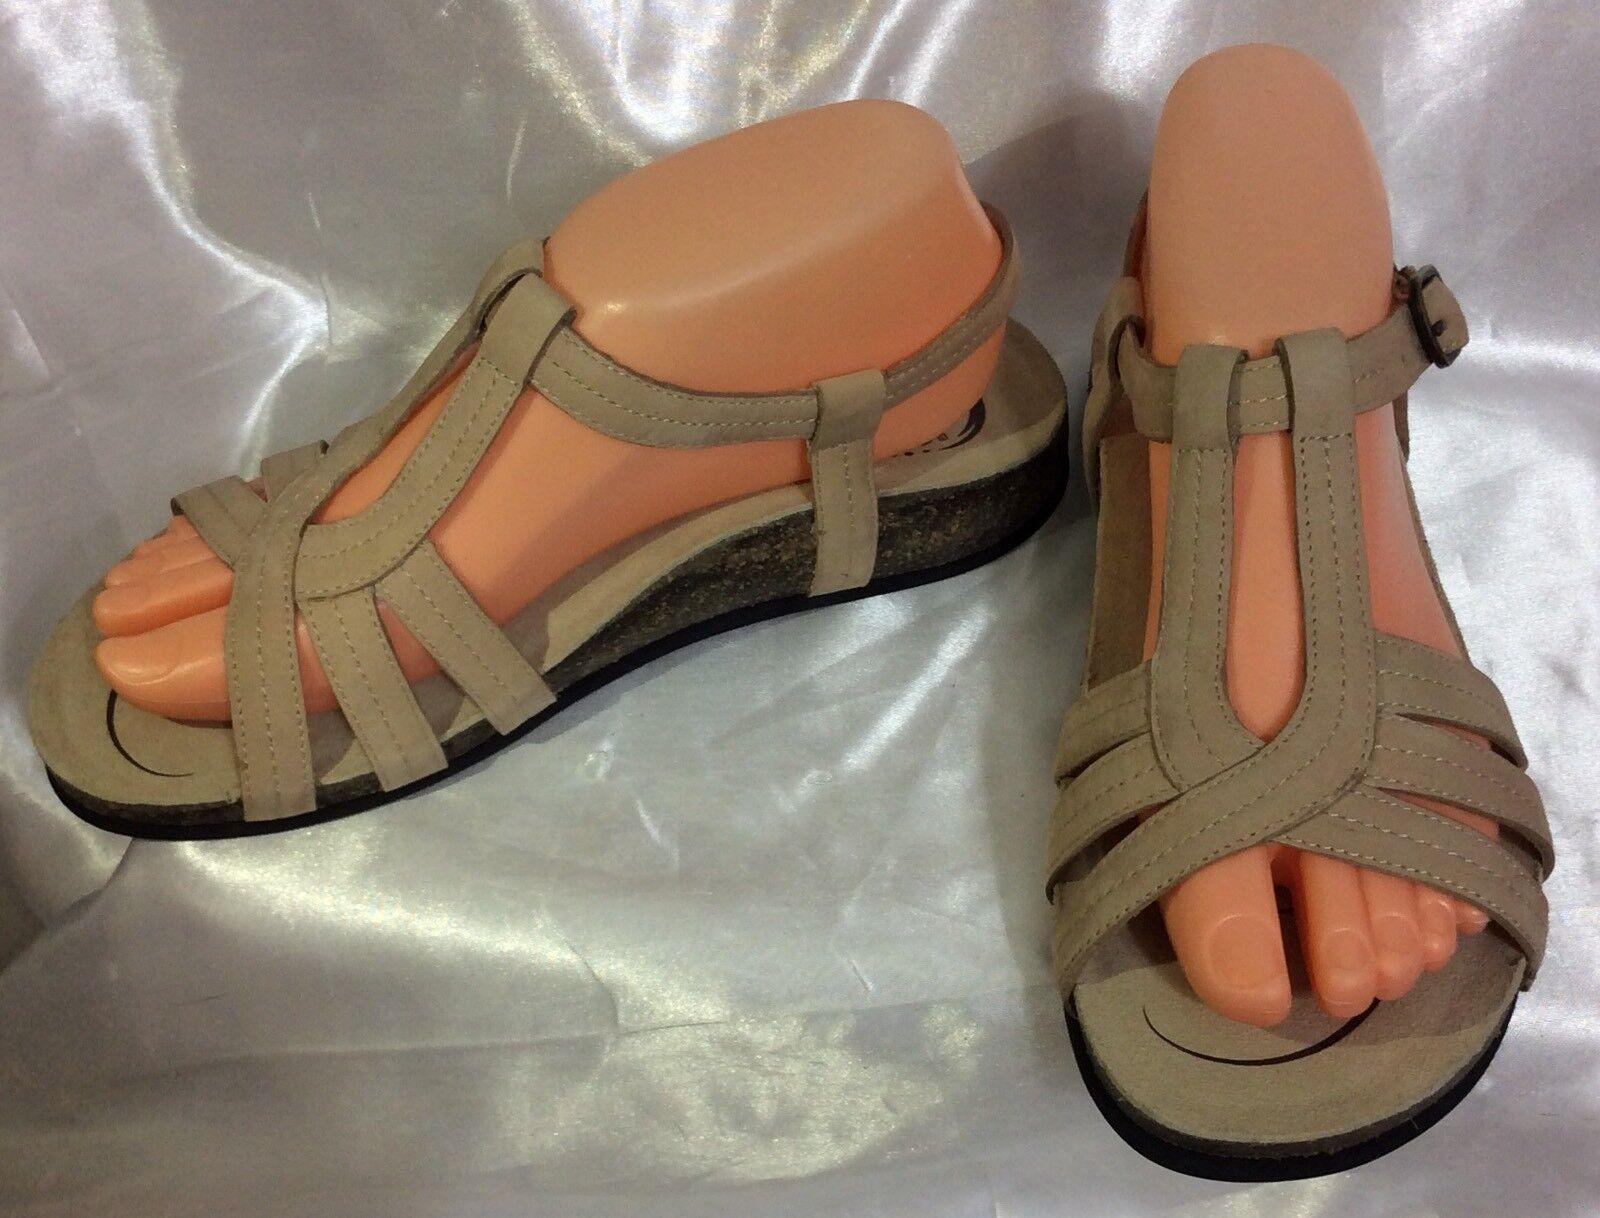 Abeo BARA Bio System Biege Leather Strappy Strappy Strappy Cork Sole Women's Sandals sz 8N bd8d26